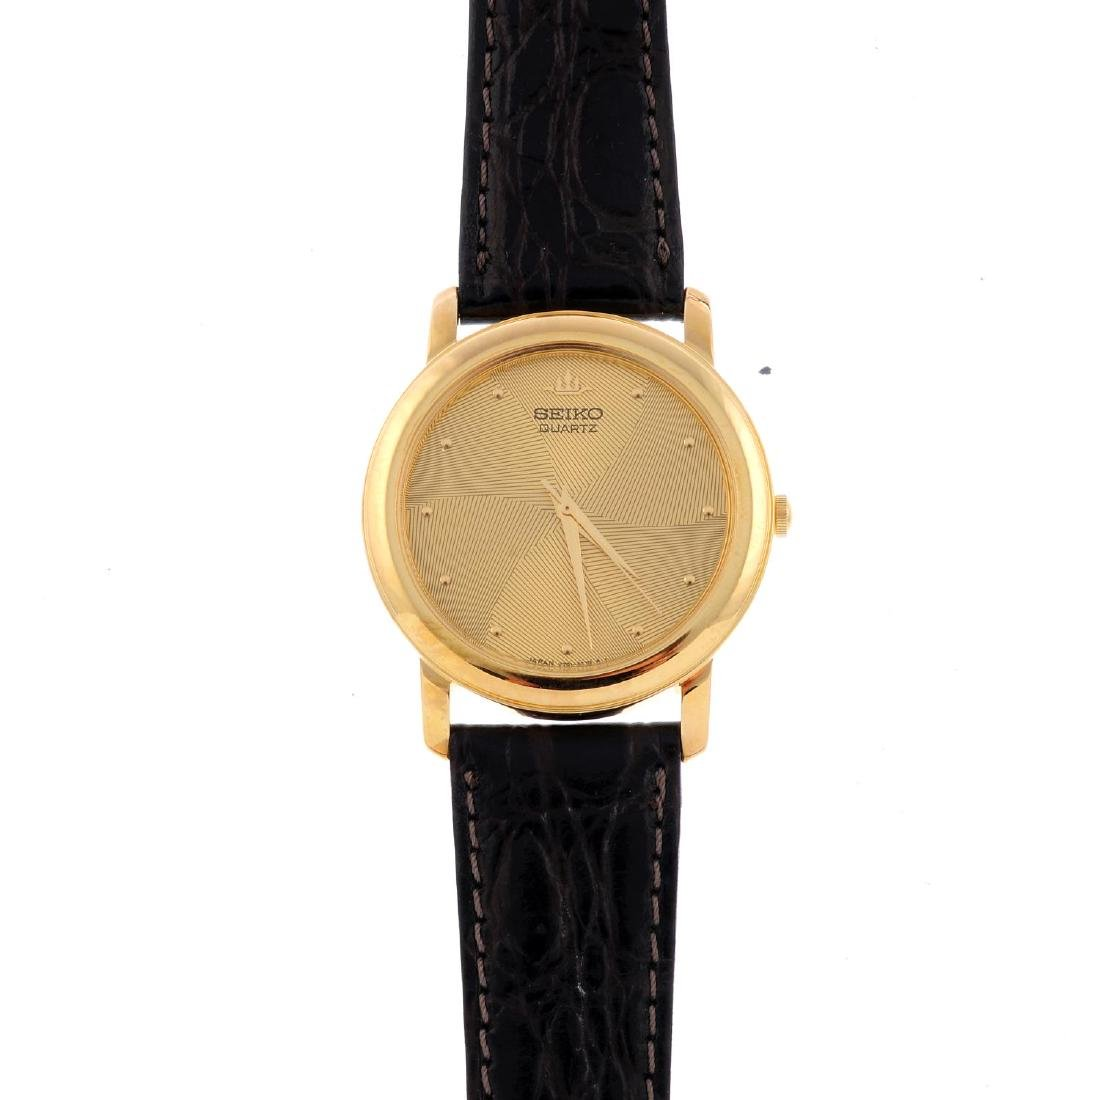 SEIKO - a gentleman's wrist watch. Gold plated case